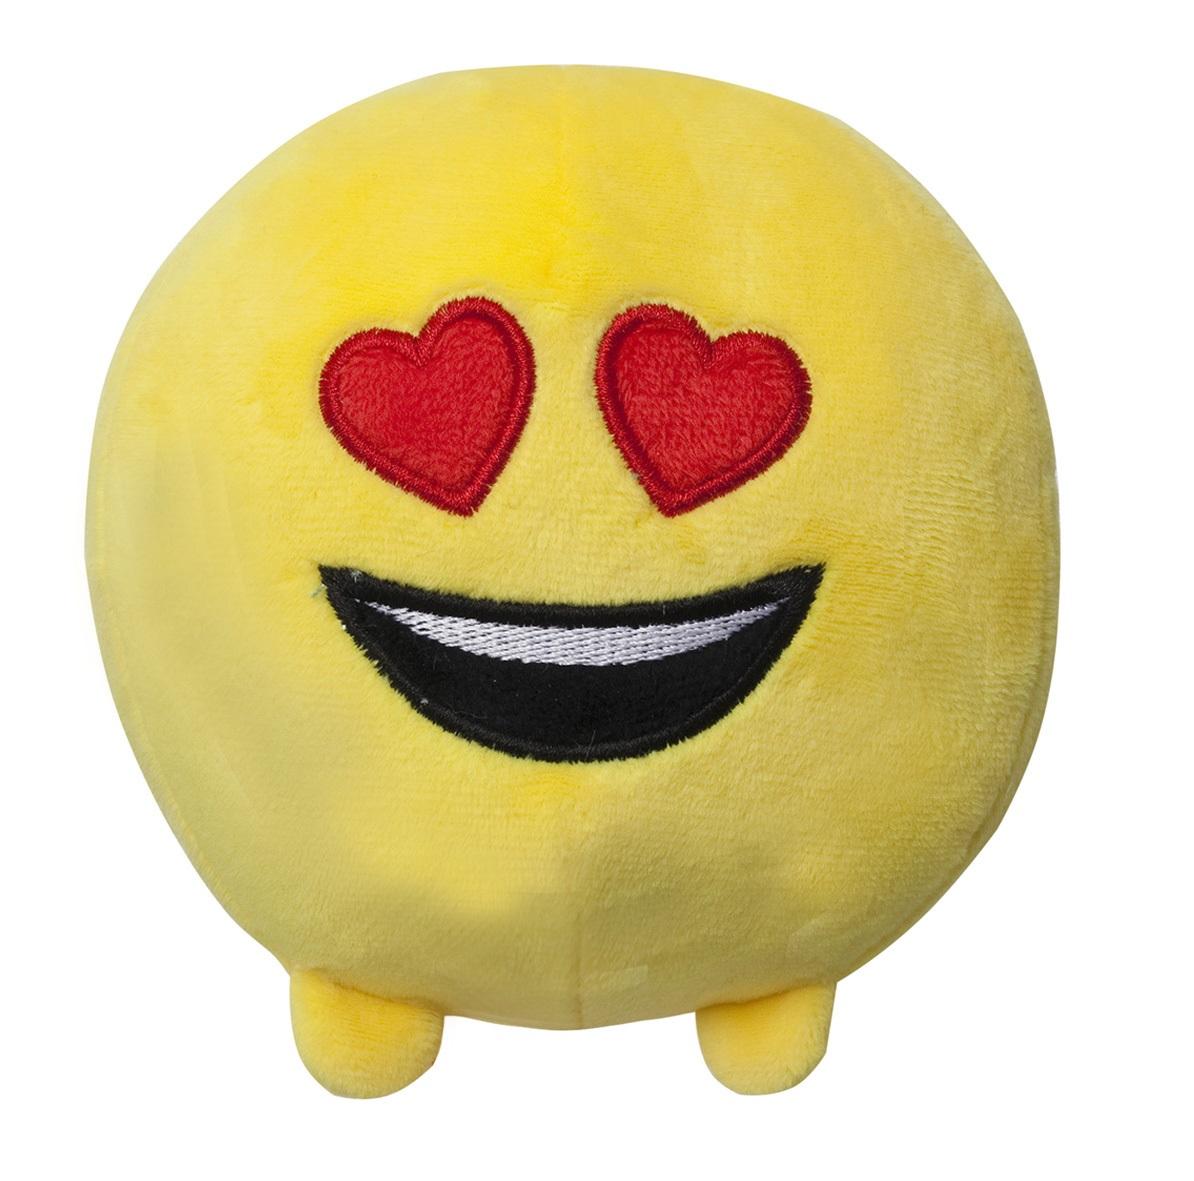 Мягкая игрушка Imoji. Влюблён (11 см)